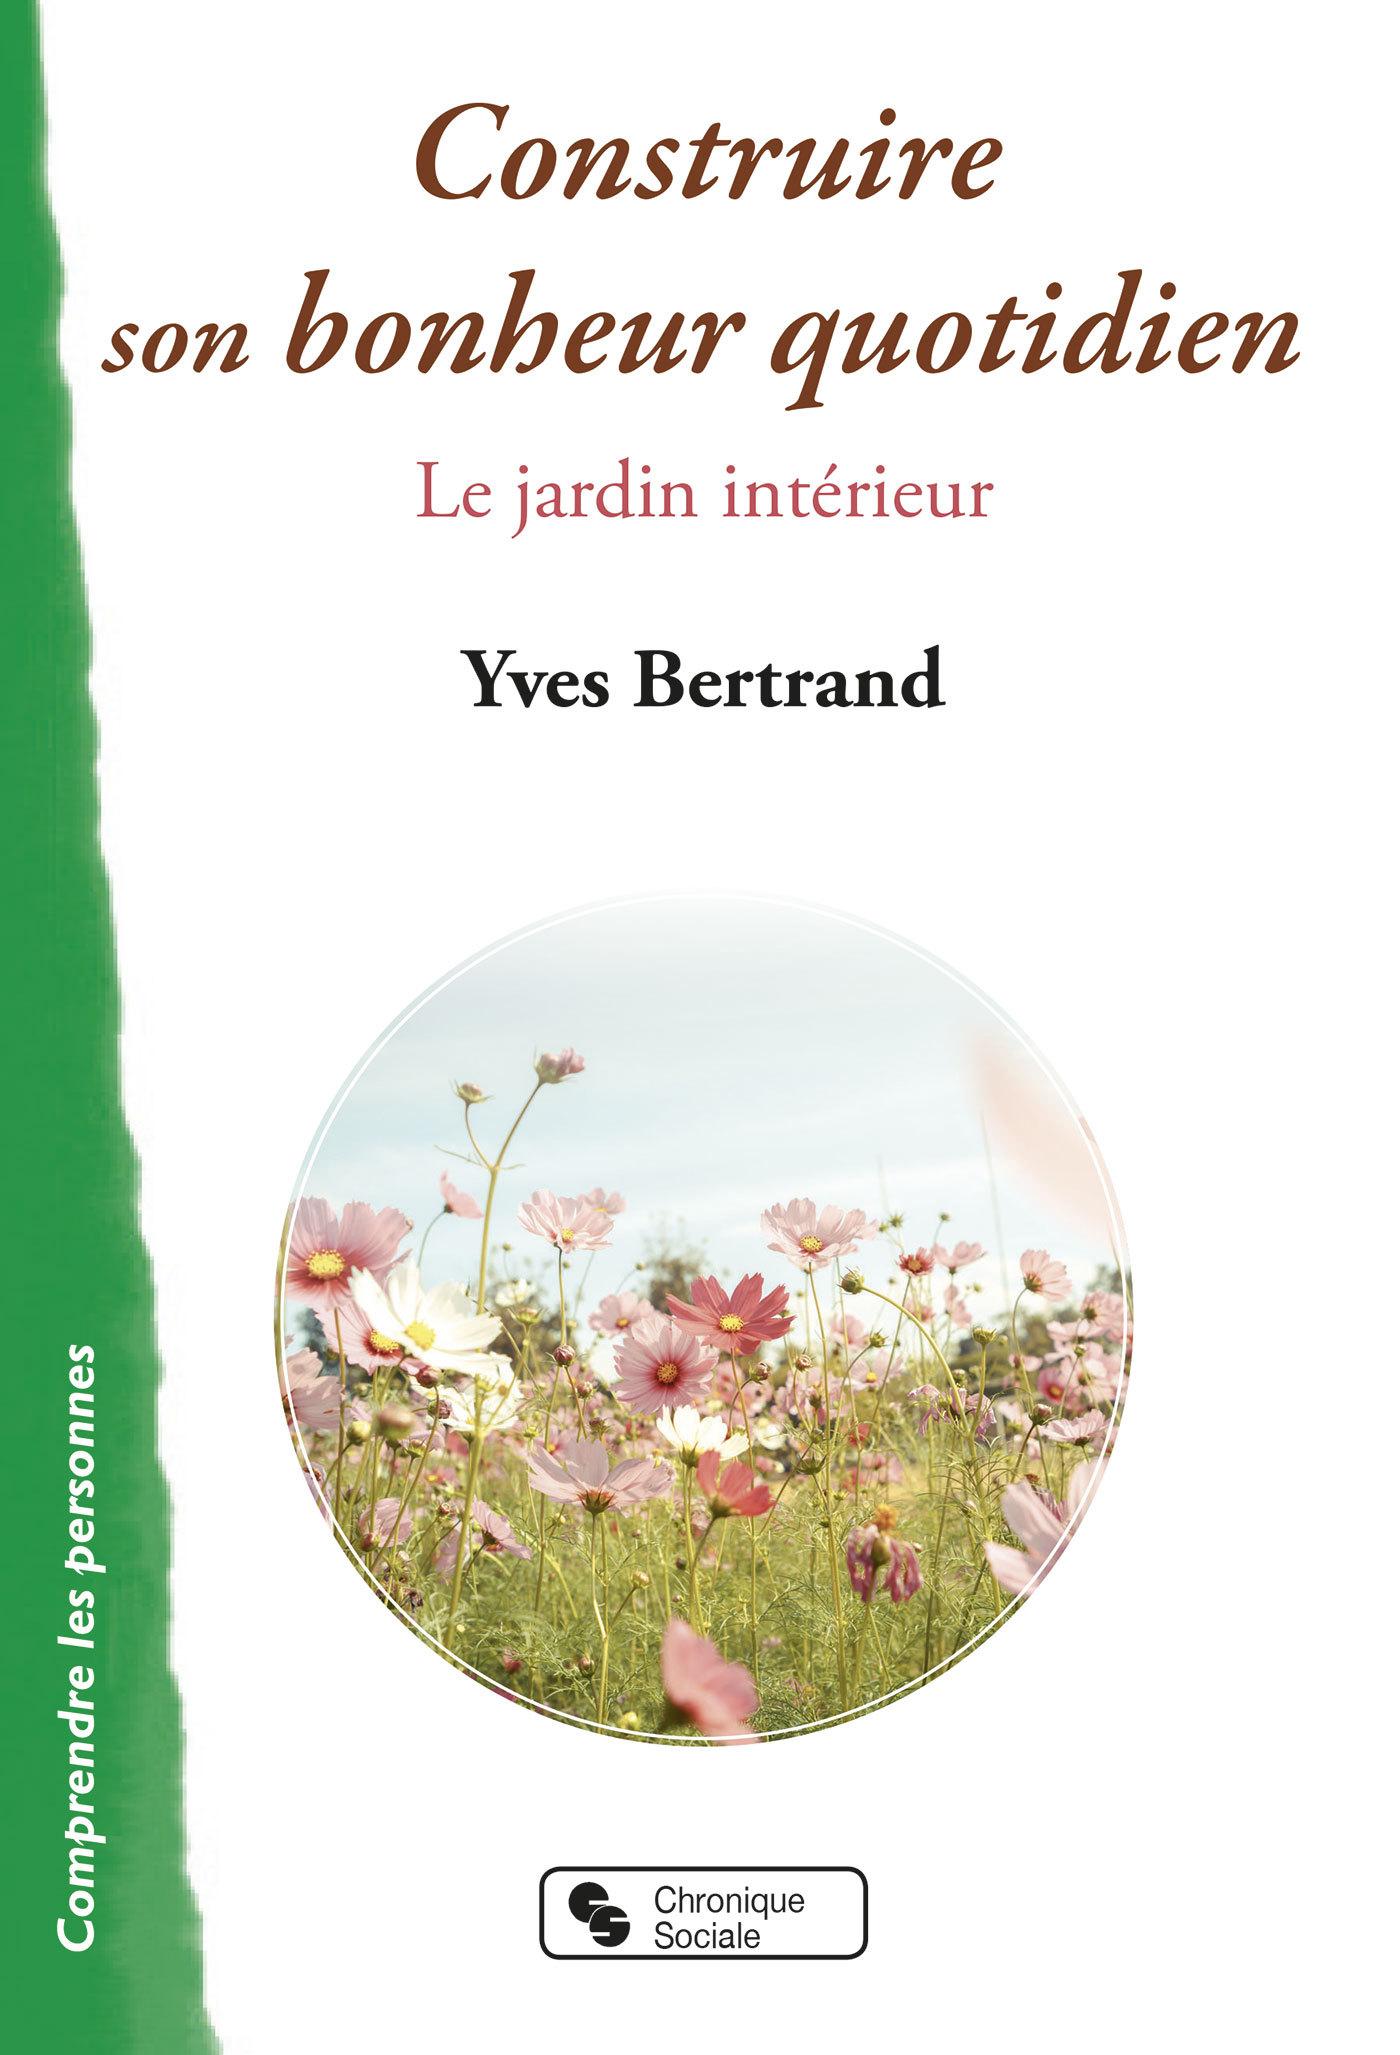 CONSTRUIRE SON BONHEUR QUOTIDIEN - LE JARDIN INTERIEUR